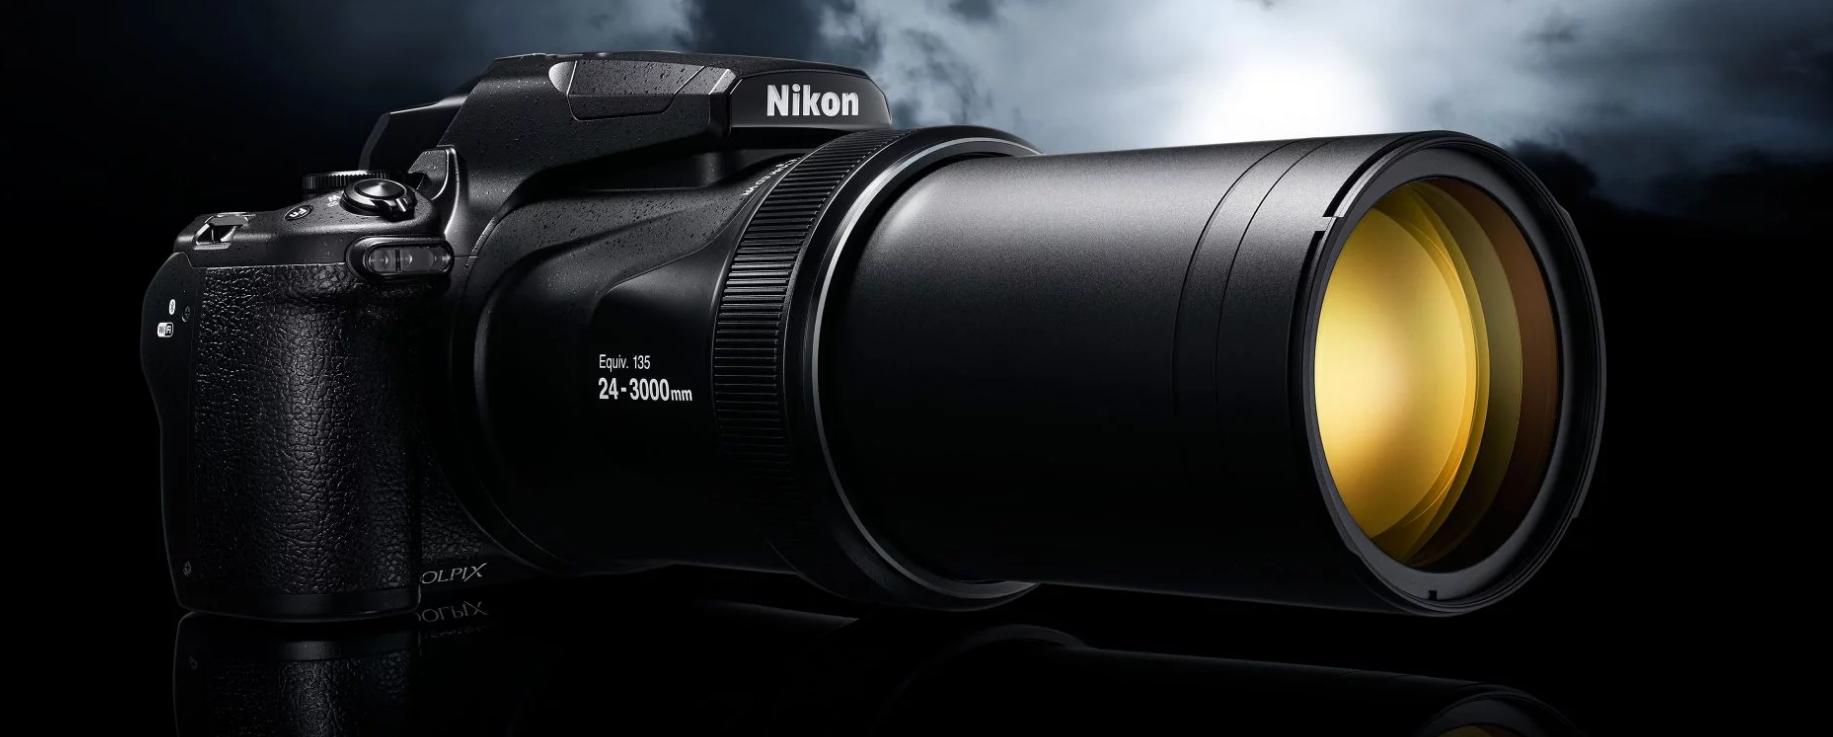 Nikon Coolpix P1000 With 24 3000mm Coolpix Nikon Coolpix Nikon Coolpix P900